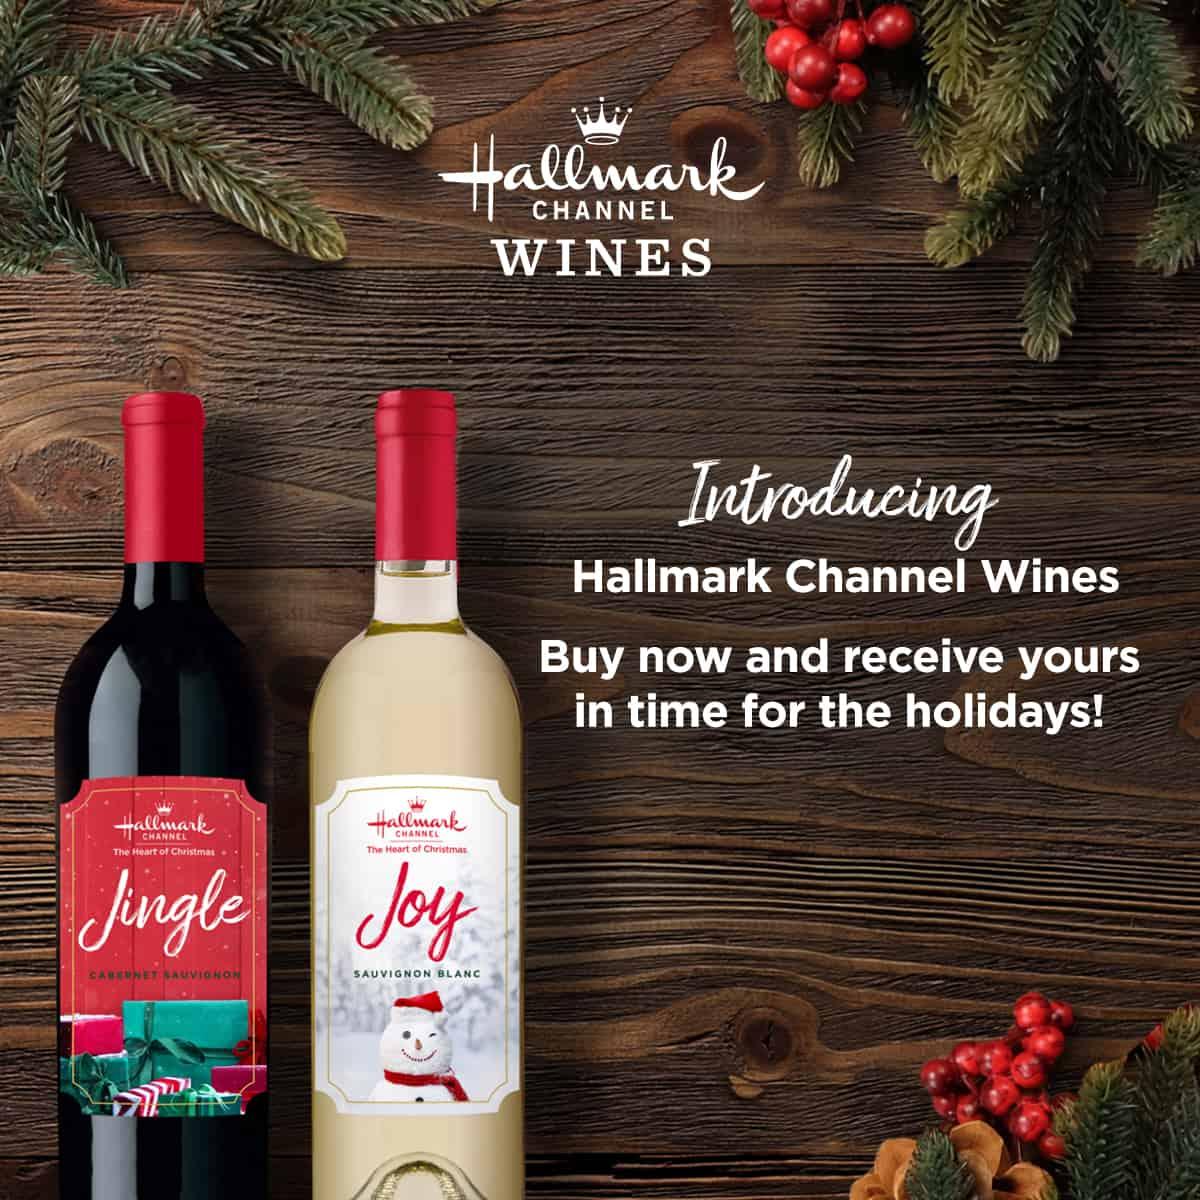 hallmark wine promotional graphic